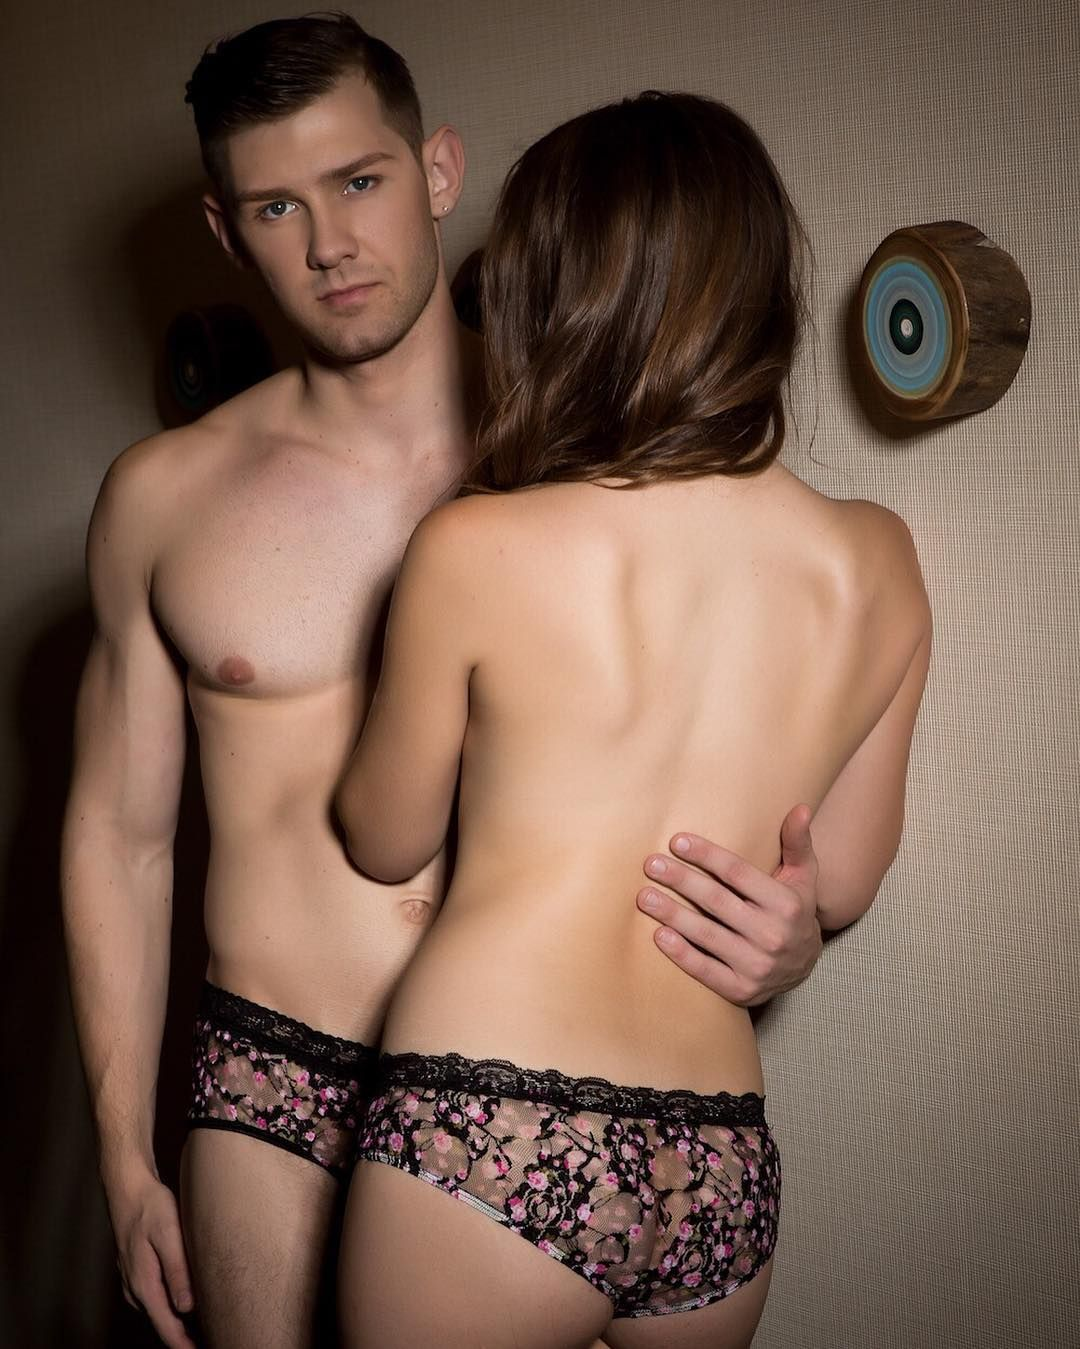 Sexy pornstar jaycie lane up close and personal